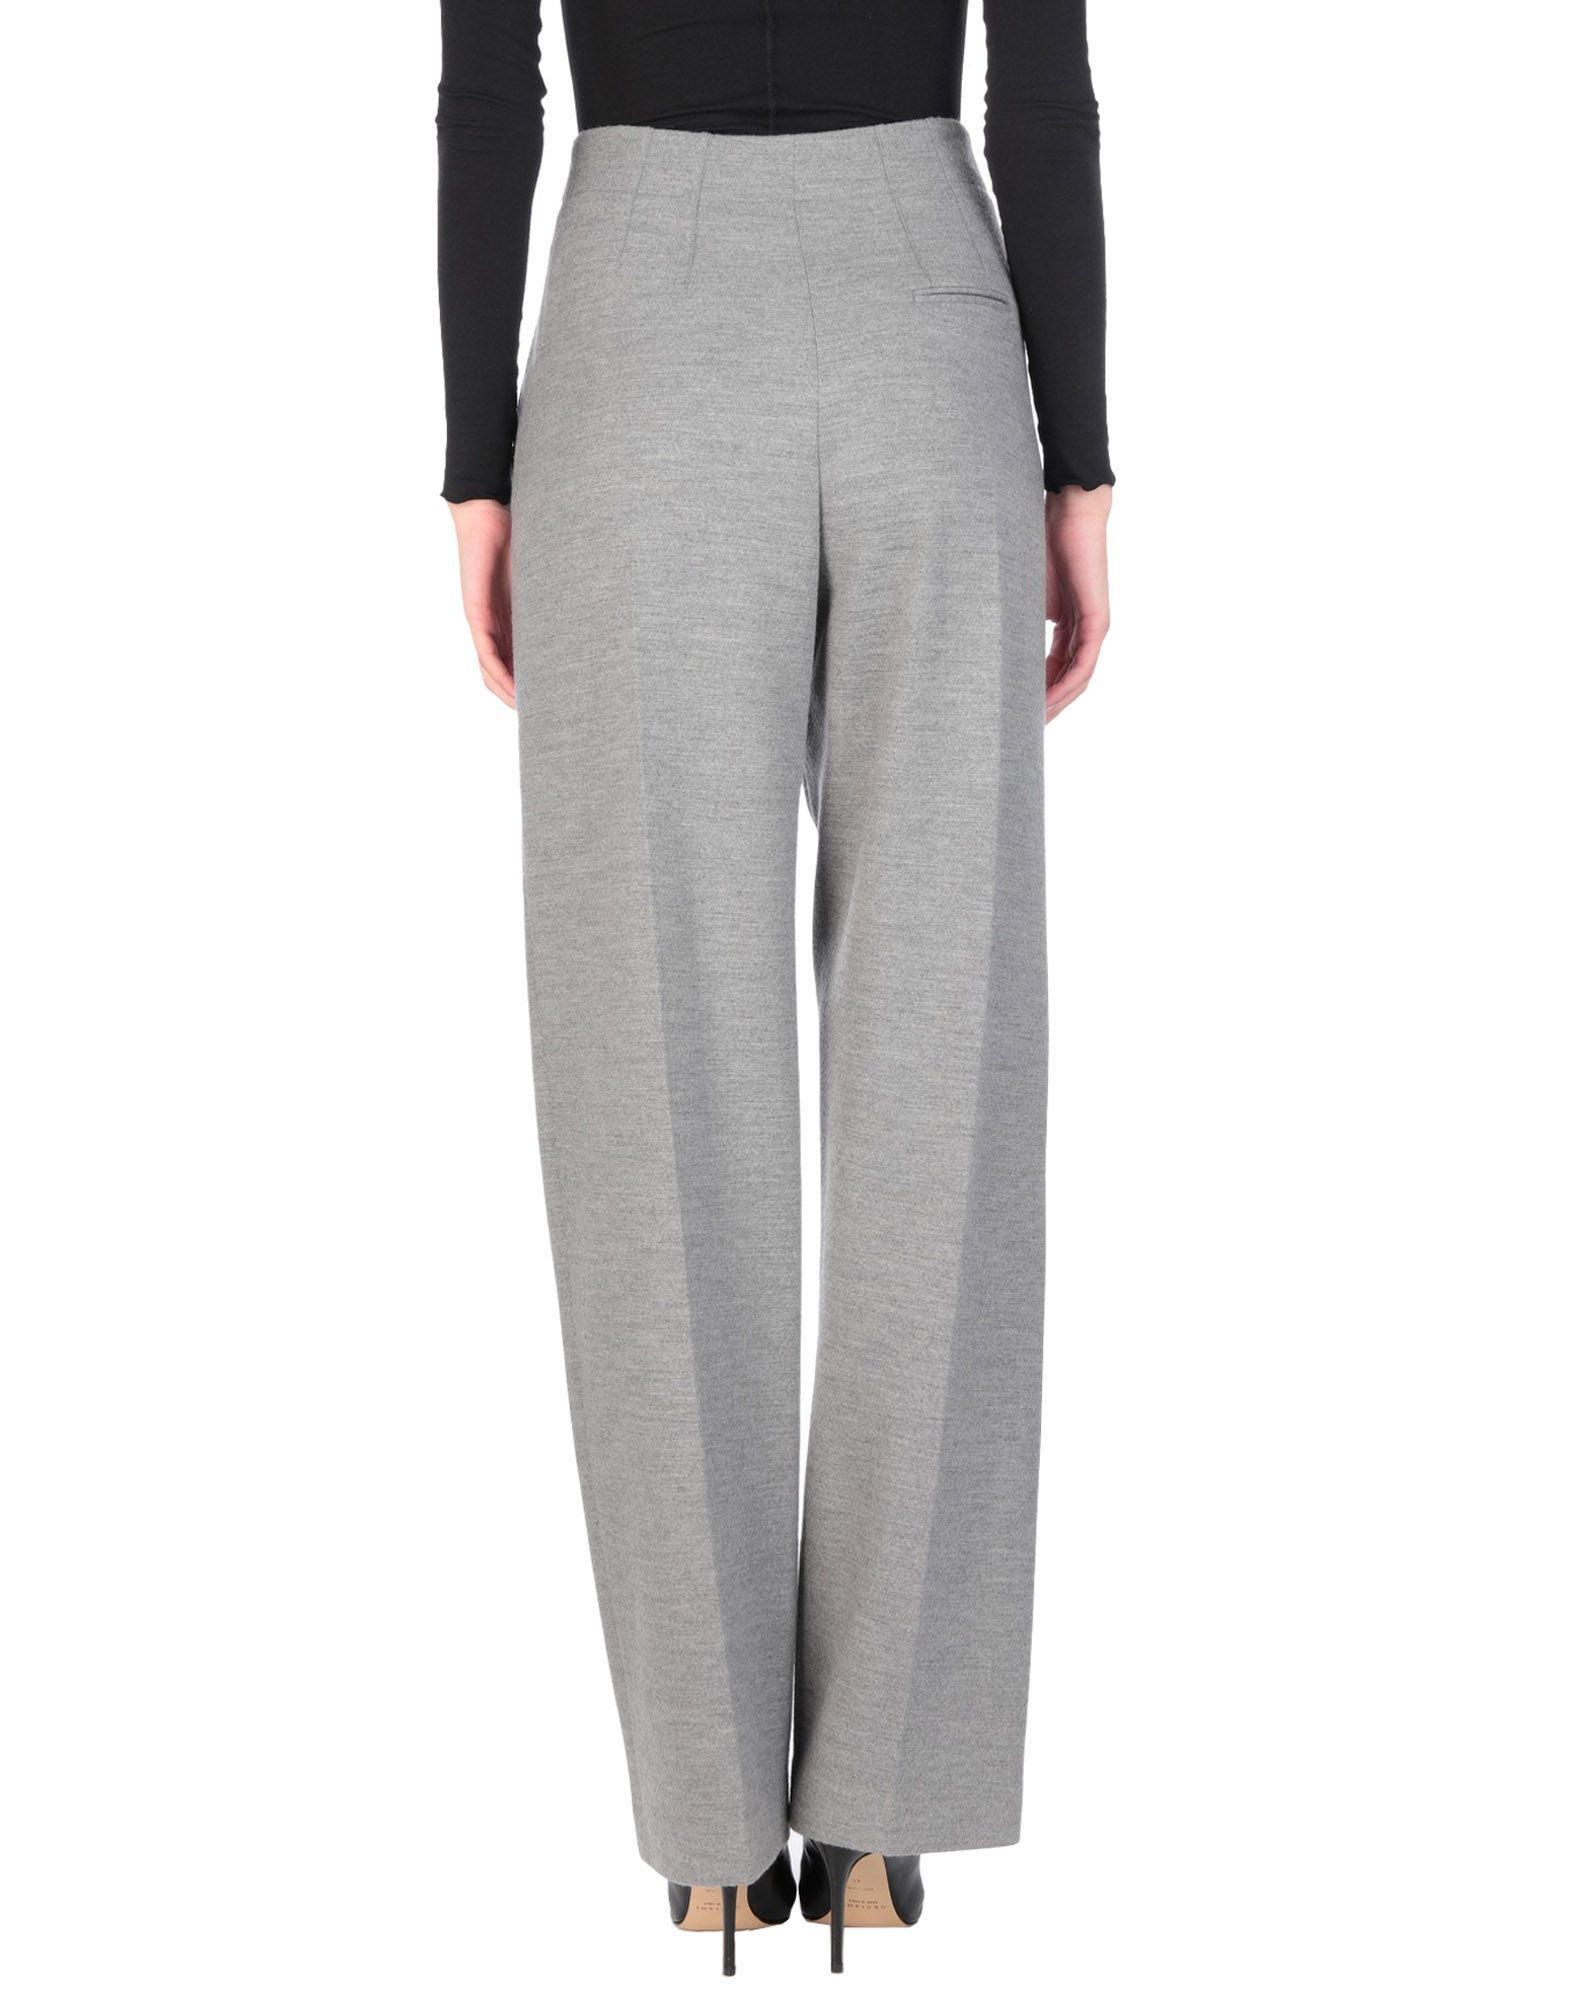 Stella McCartney Grey Wool Tailored Trousers